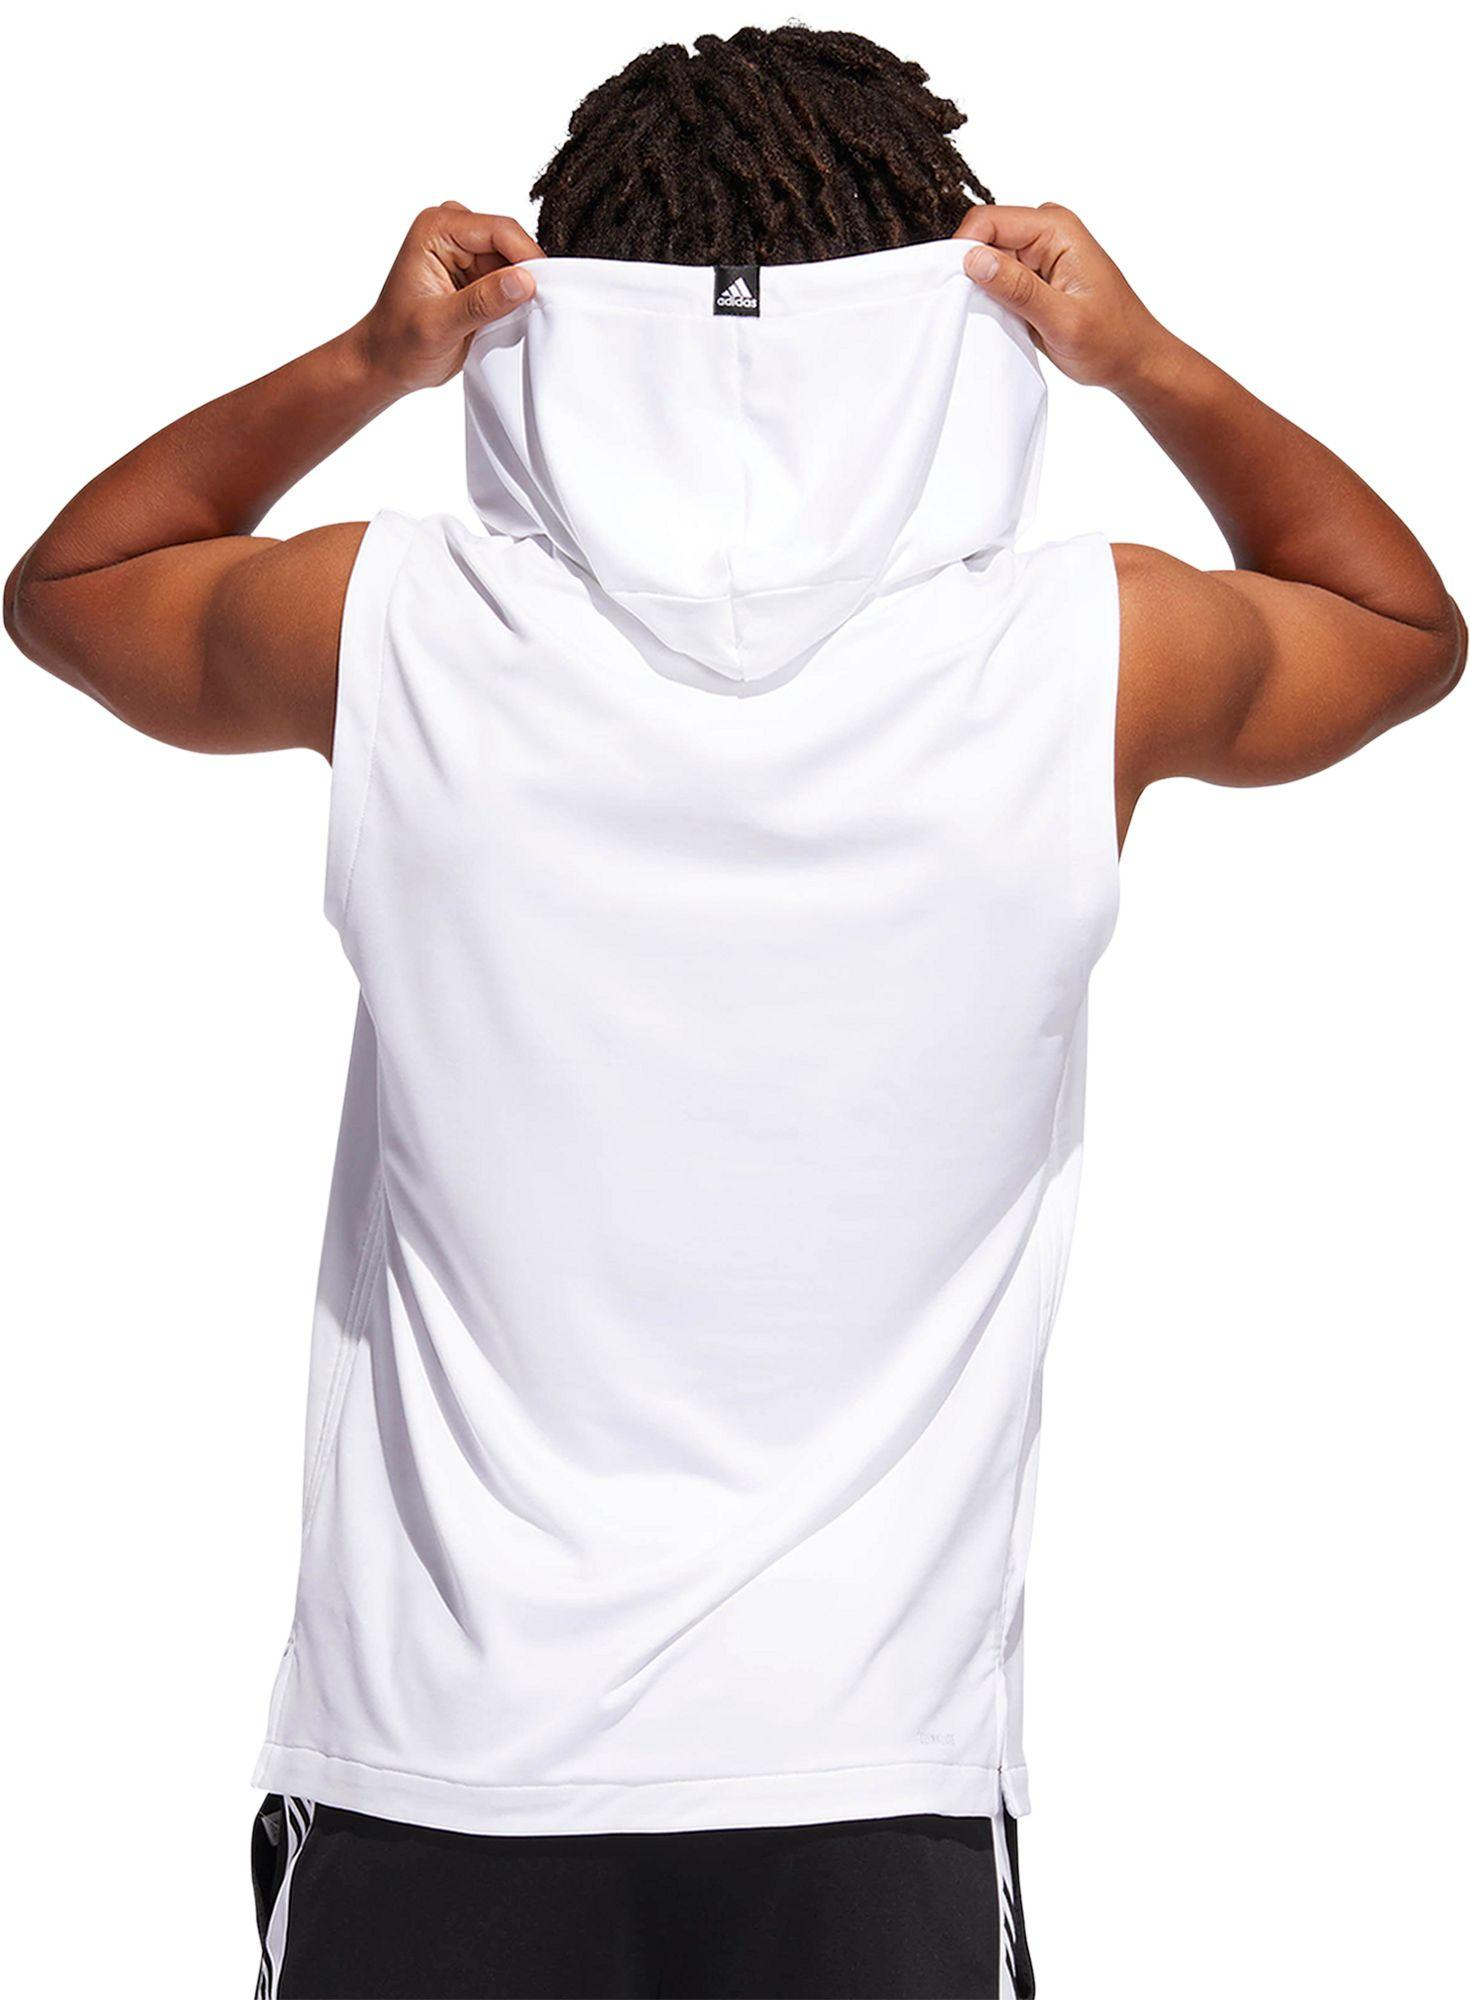 260b2cb6 Adidas - White Pro Madness Basketball Hoodie for Men - Lyst. View fullscreen